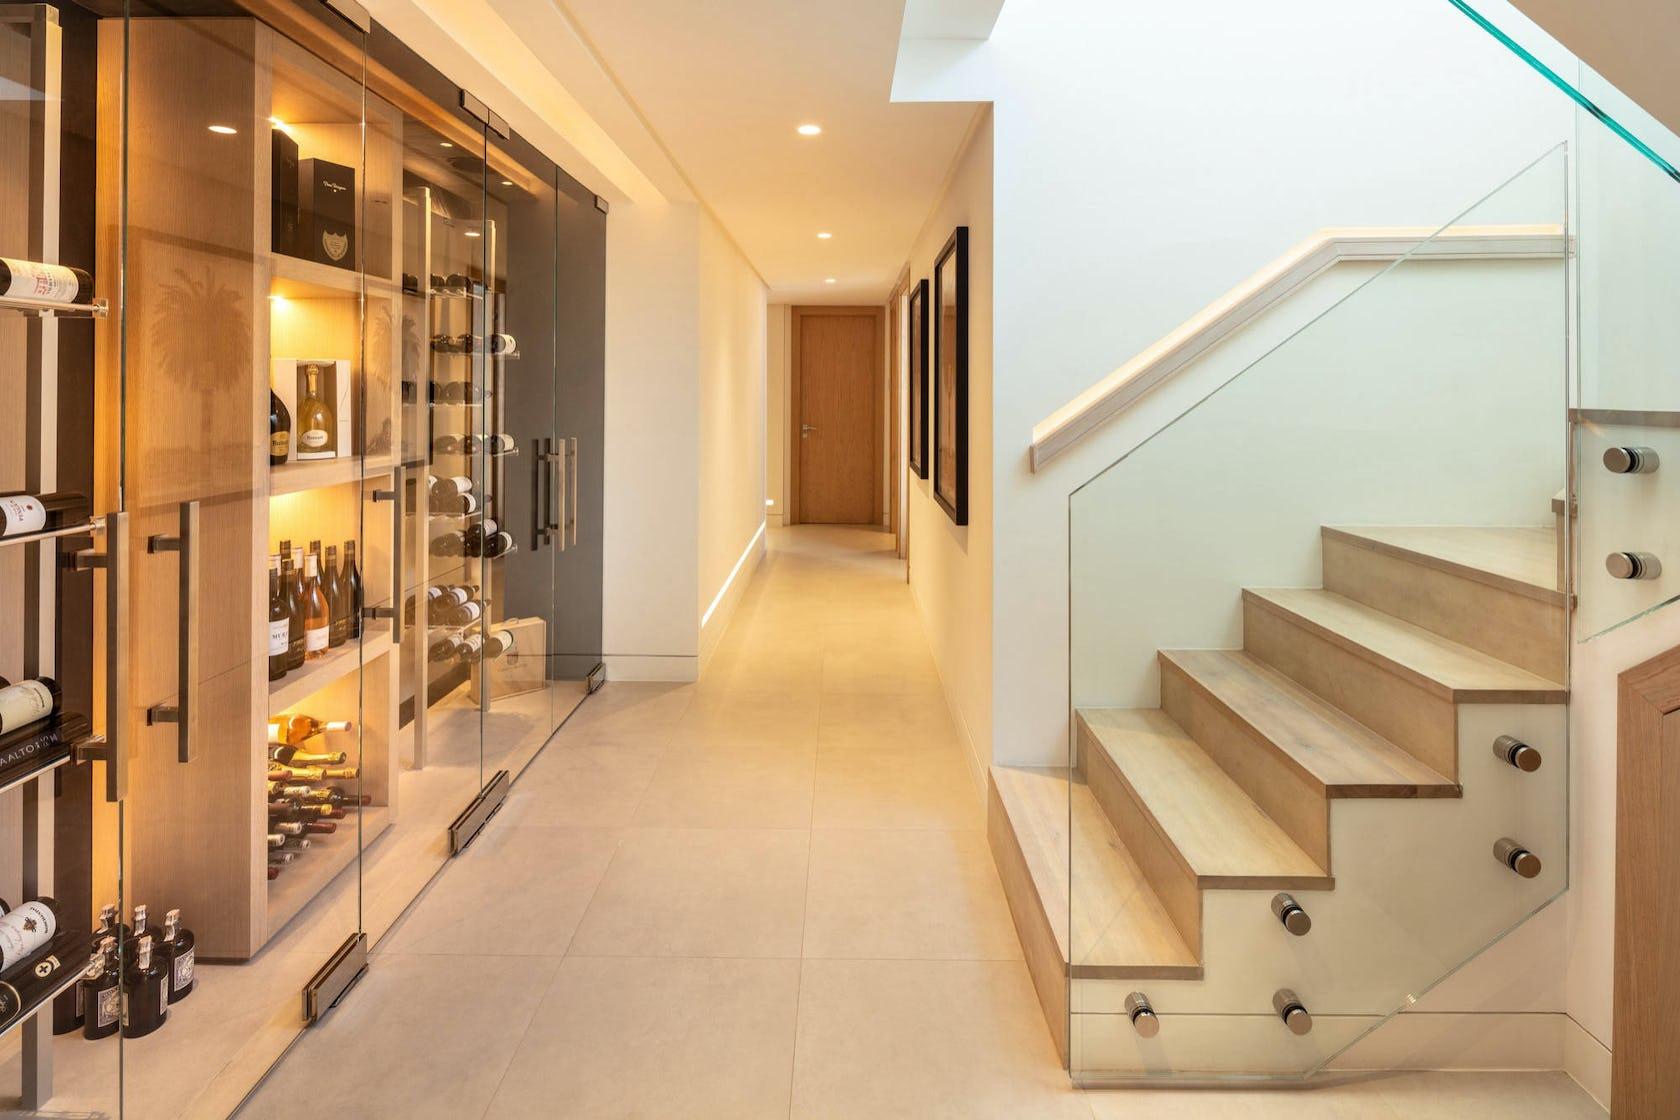 flooring floor shelf wood interior design indoors living room room